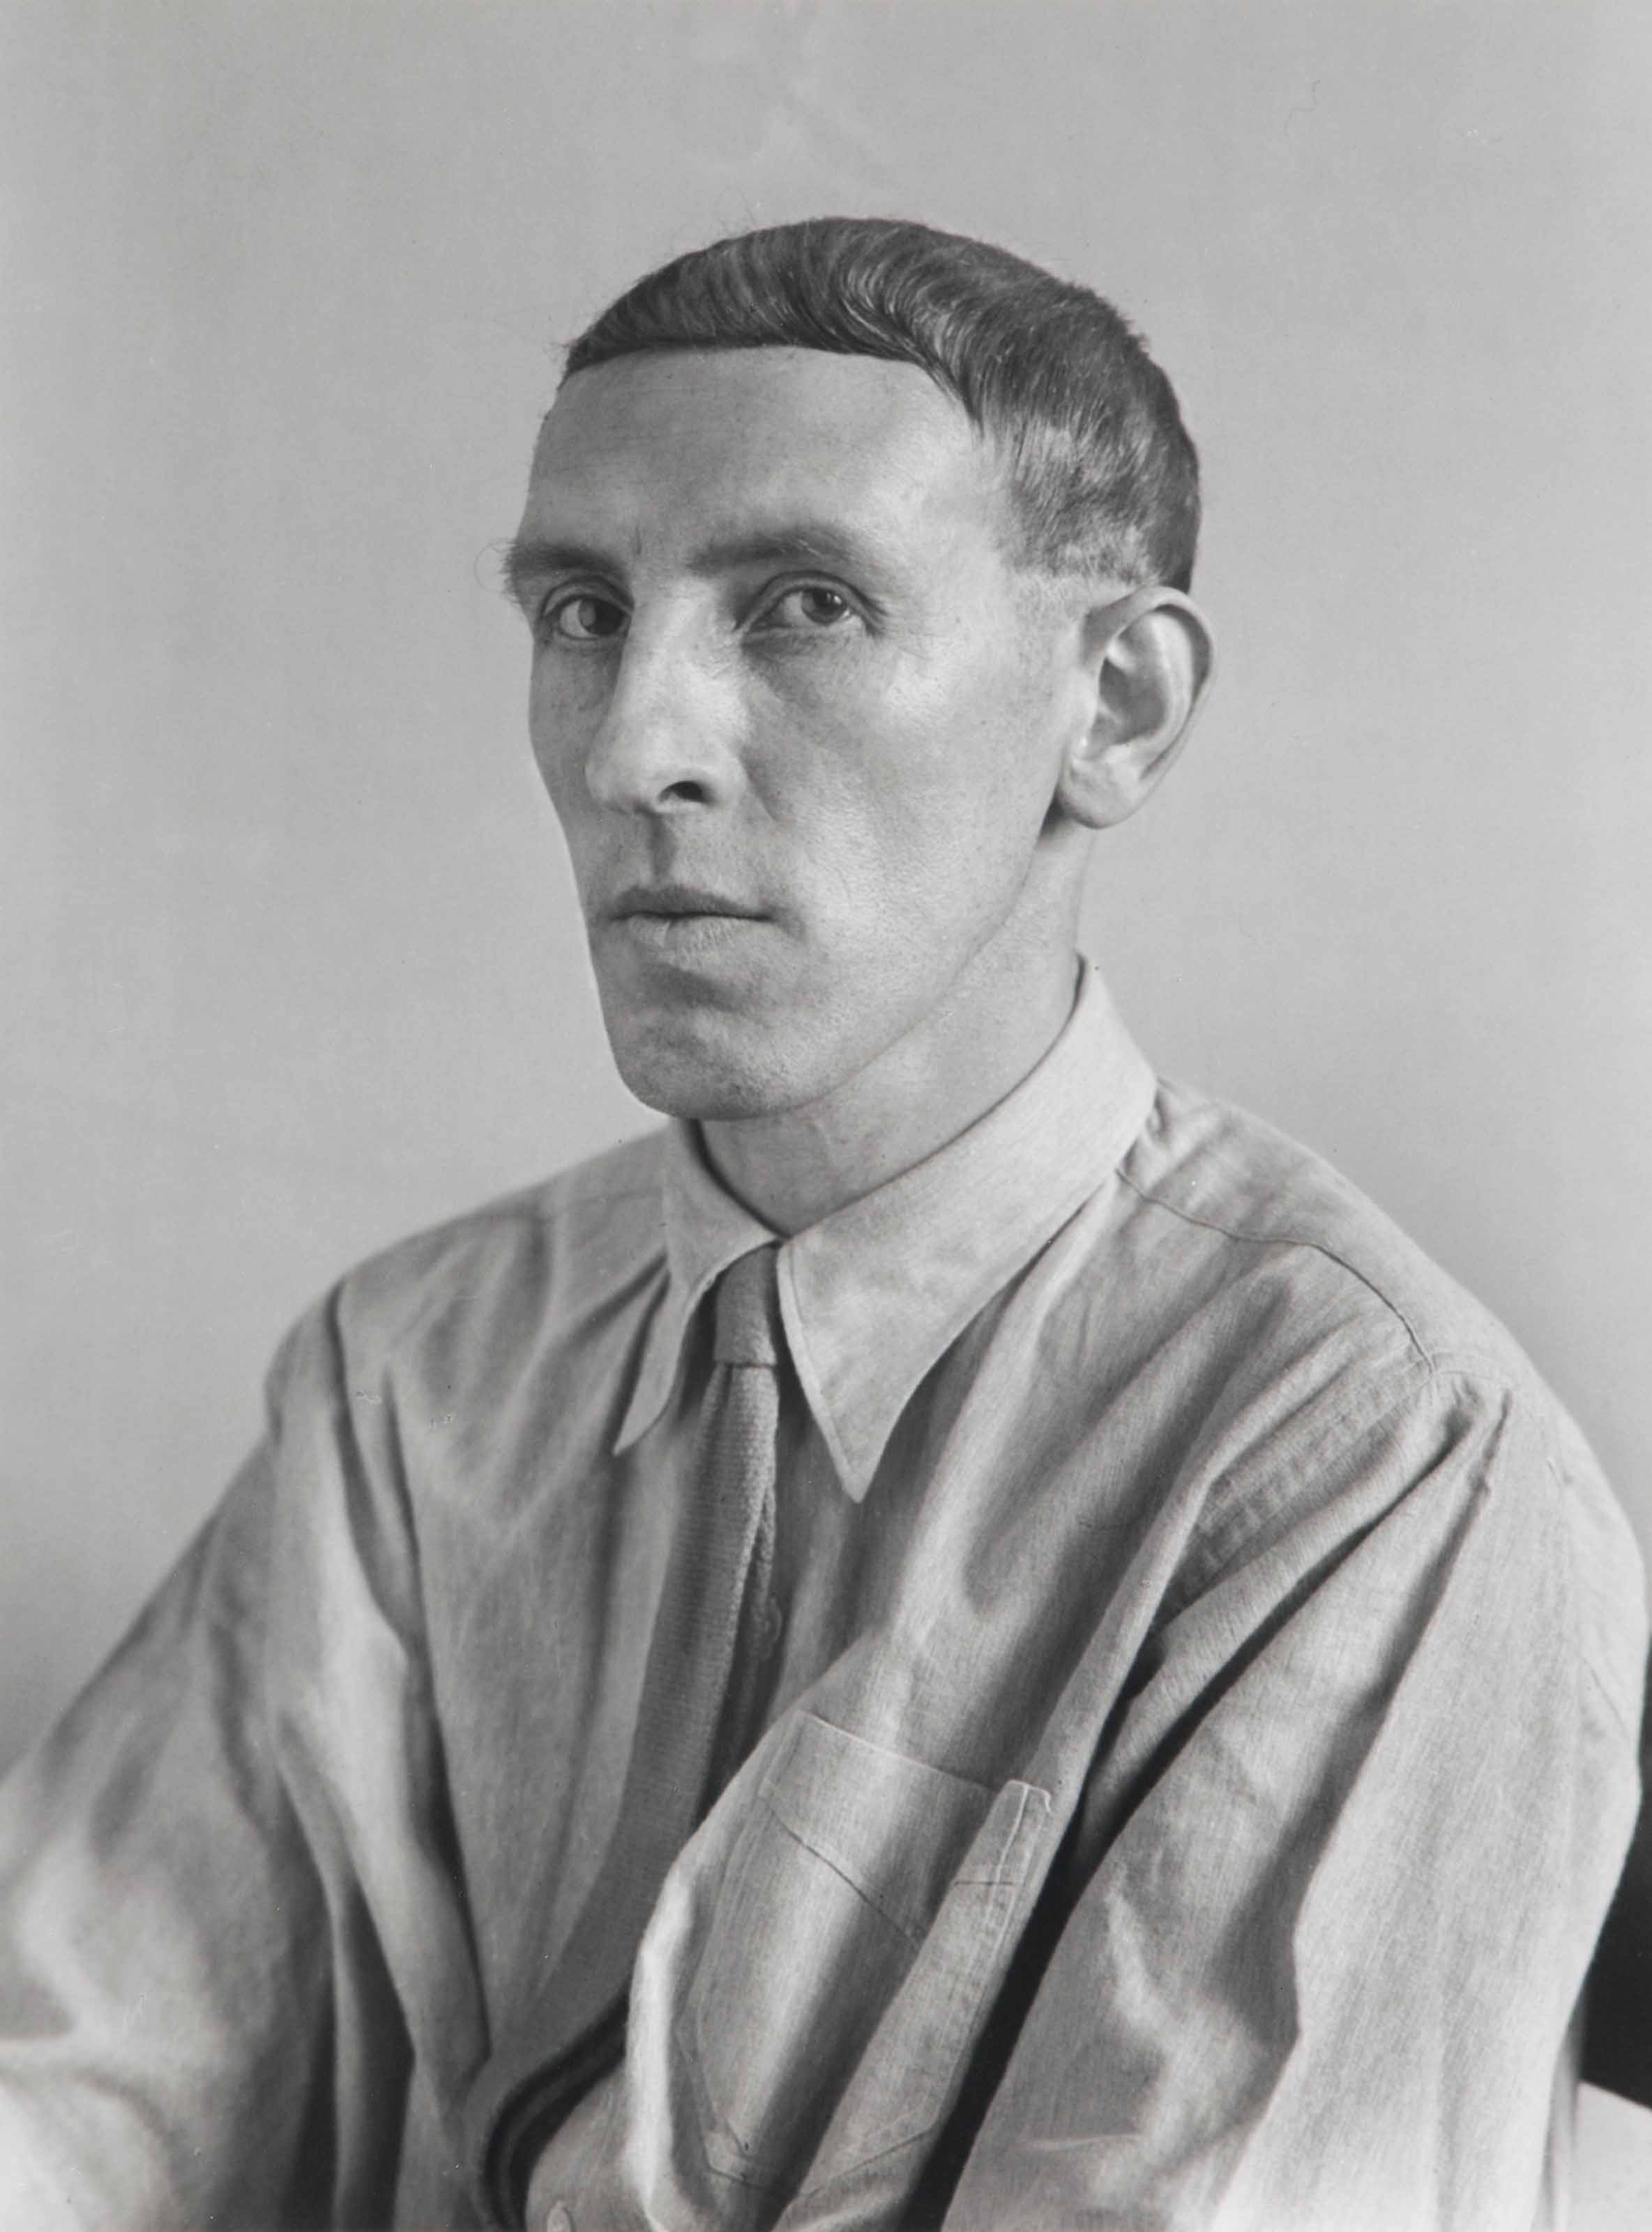 The Painter, Heinrich Hoerle, 1928